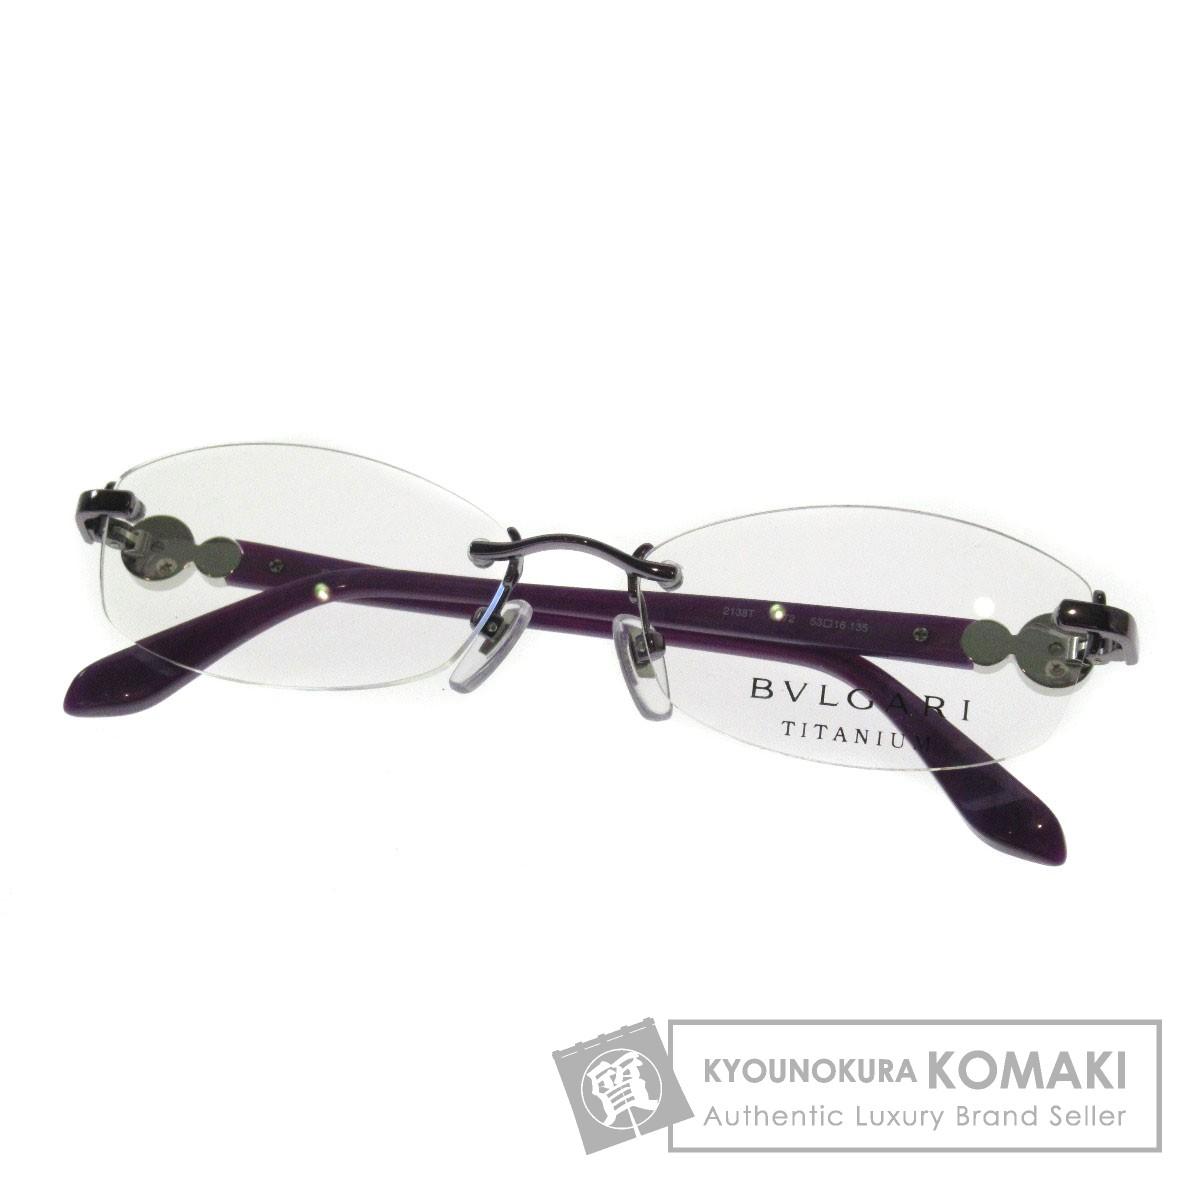 BVLGARI チタニウム 眼鏡 プラスチック レディース 【中古】【ブルガリ】